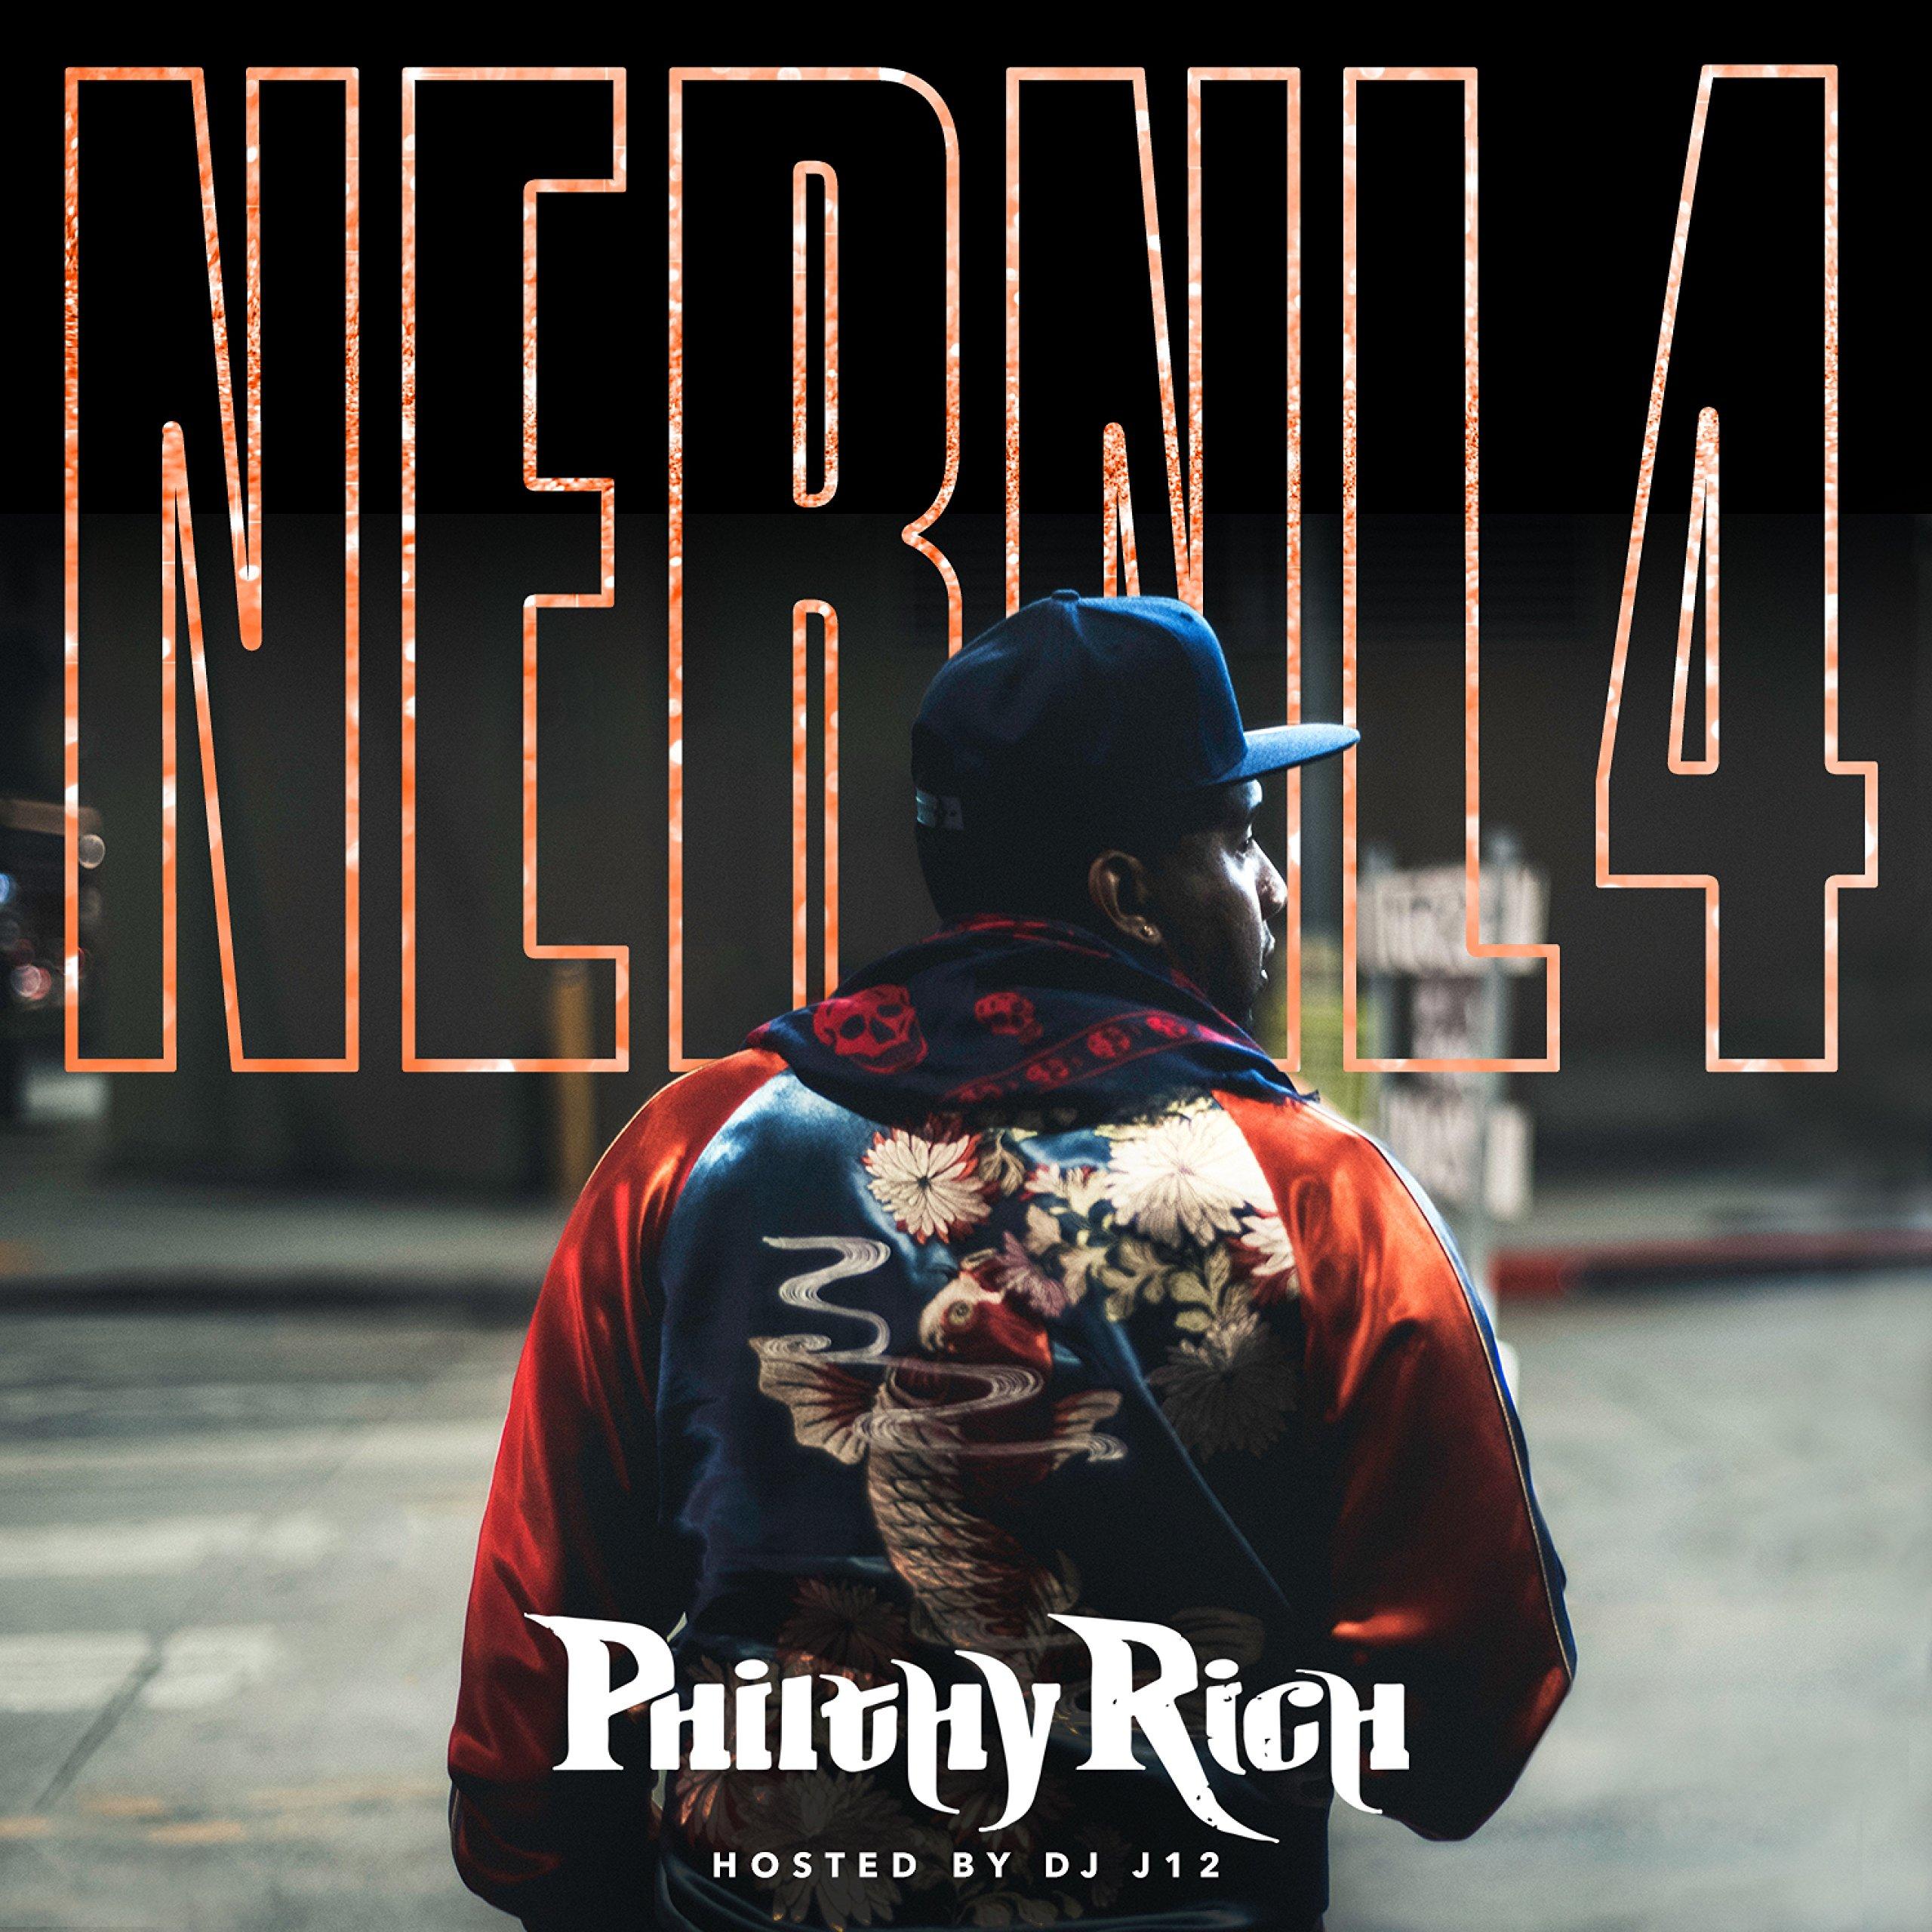 Philthy Rich – NERNL 4 (2018) [FLAC]